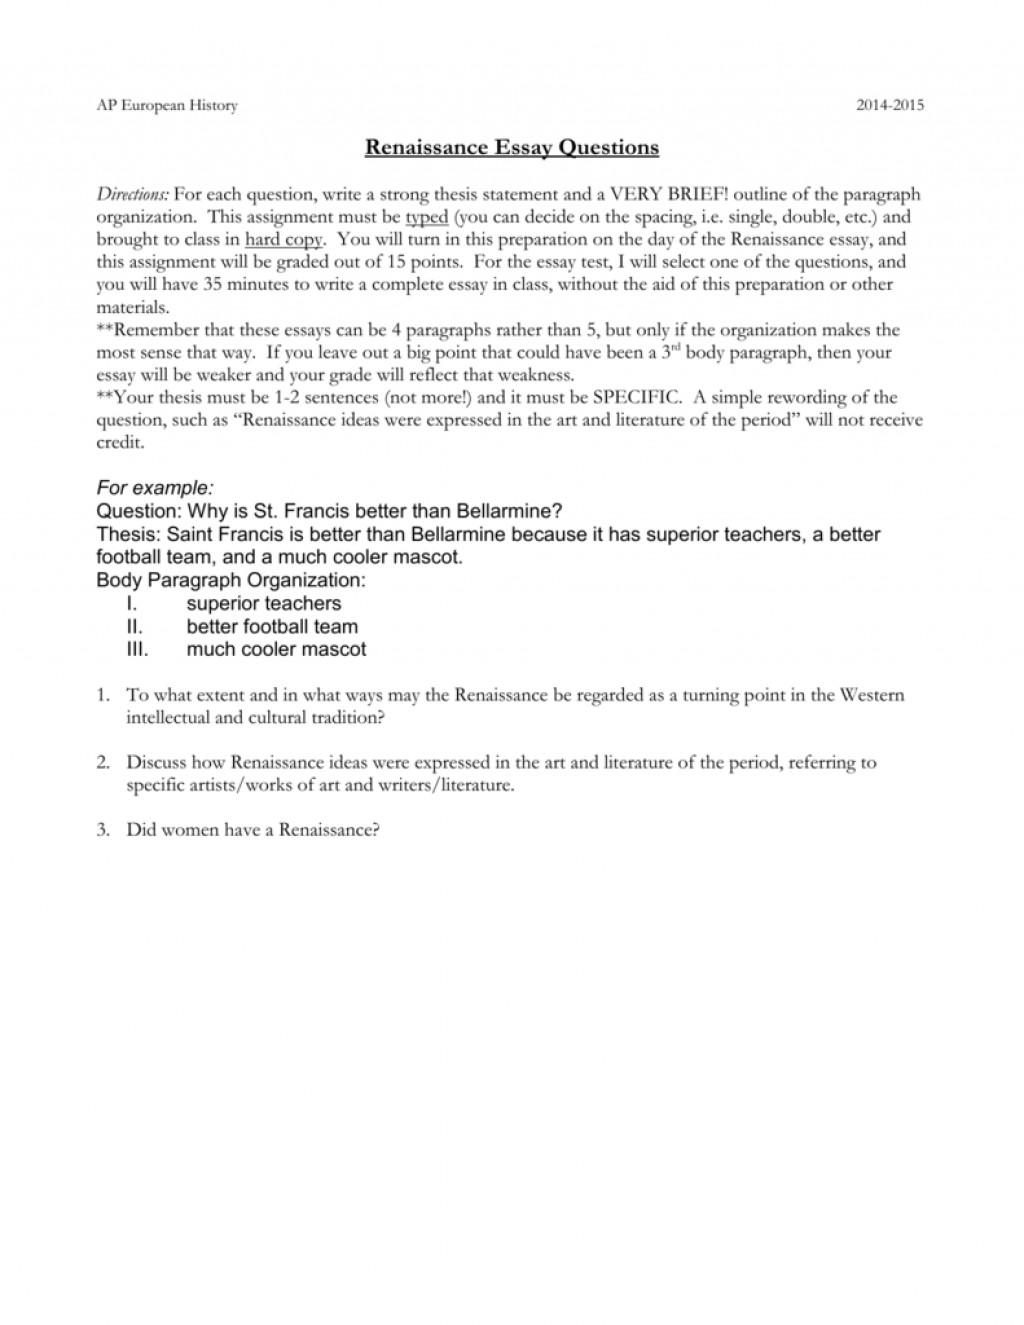 006 Renaissance Essay 008916690 1 Surprising Art Topics Harlem Introduction Large